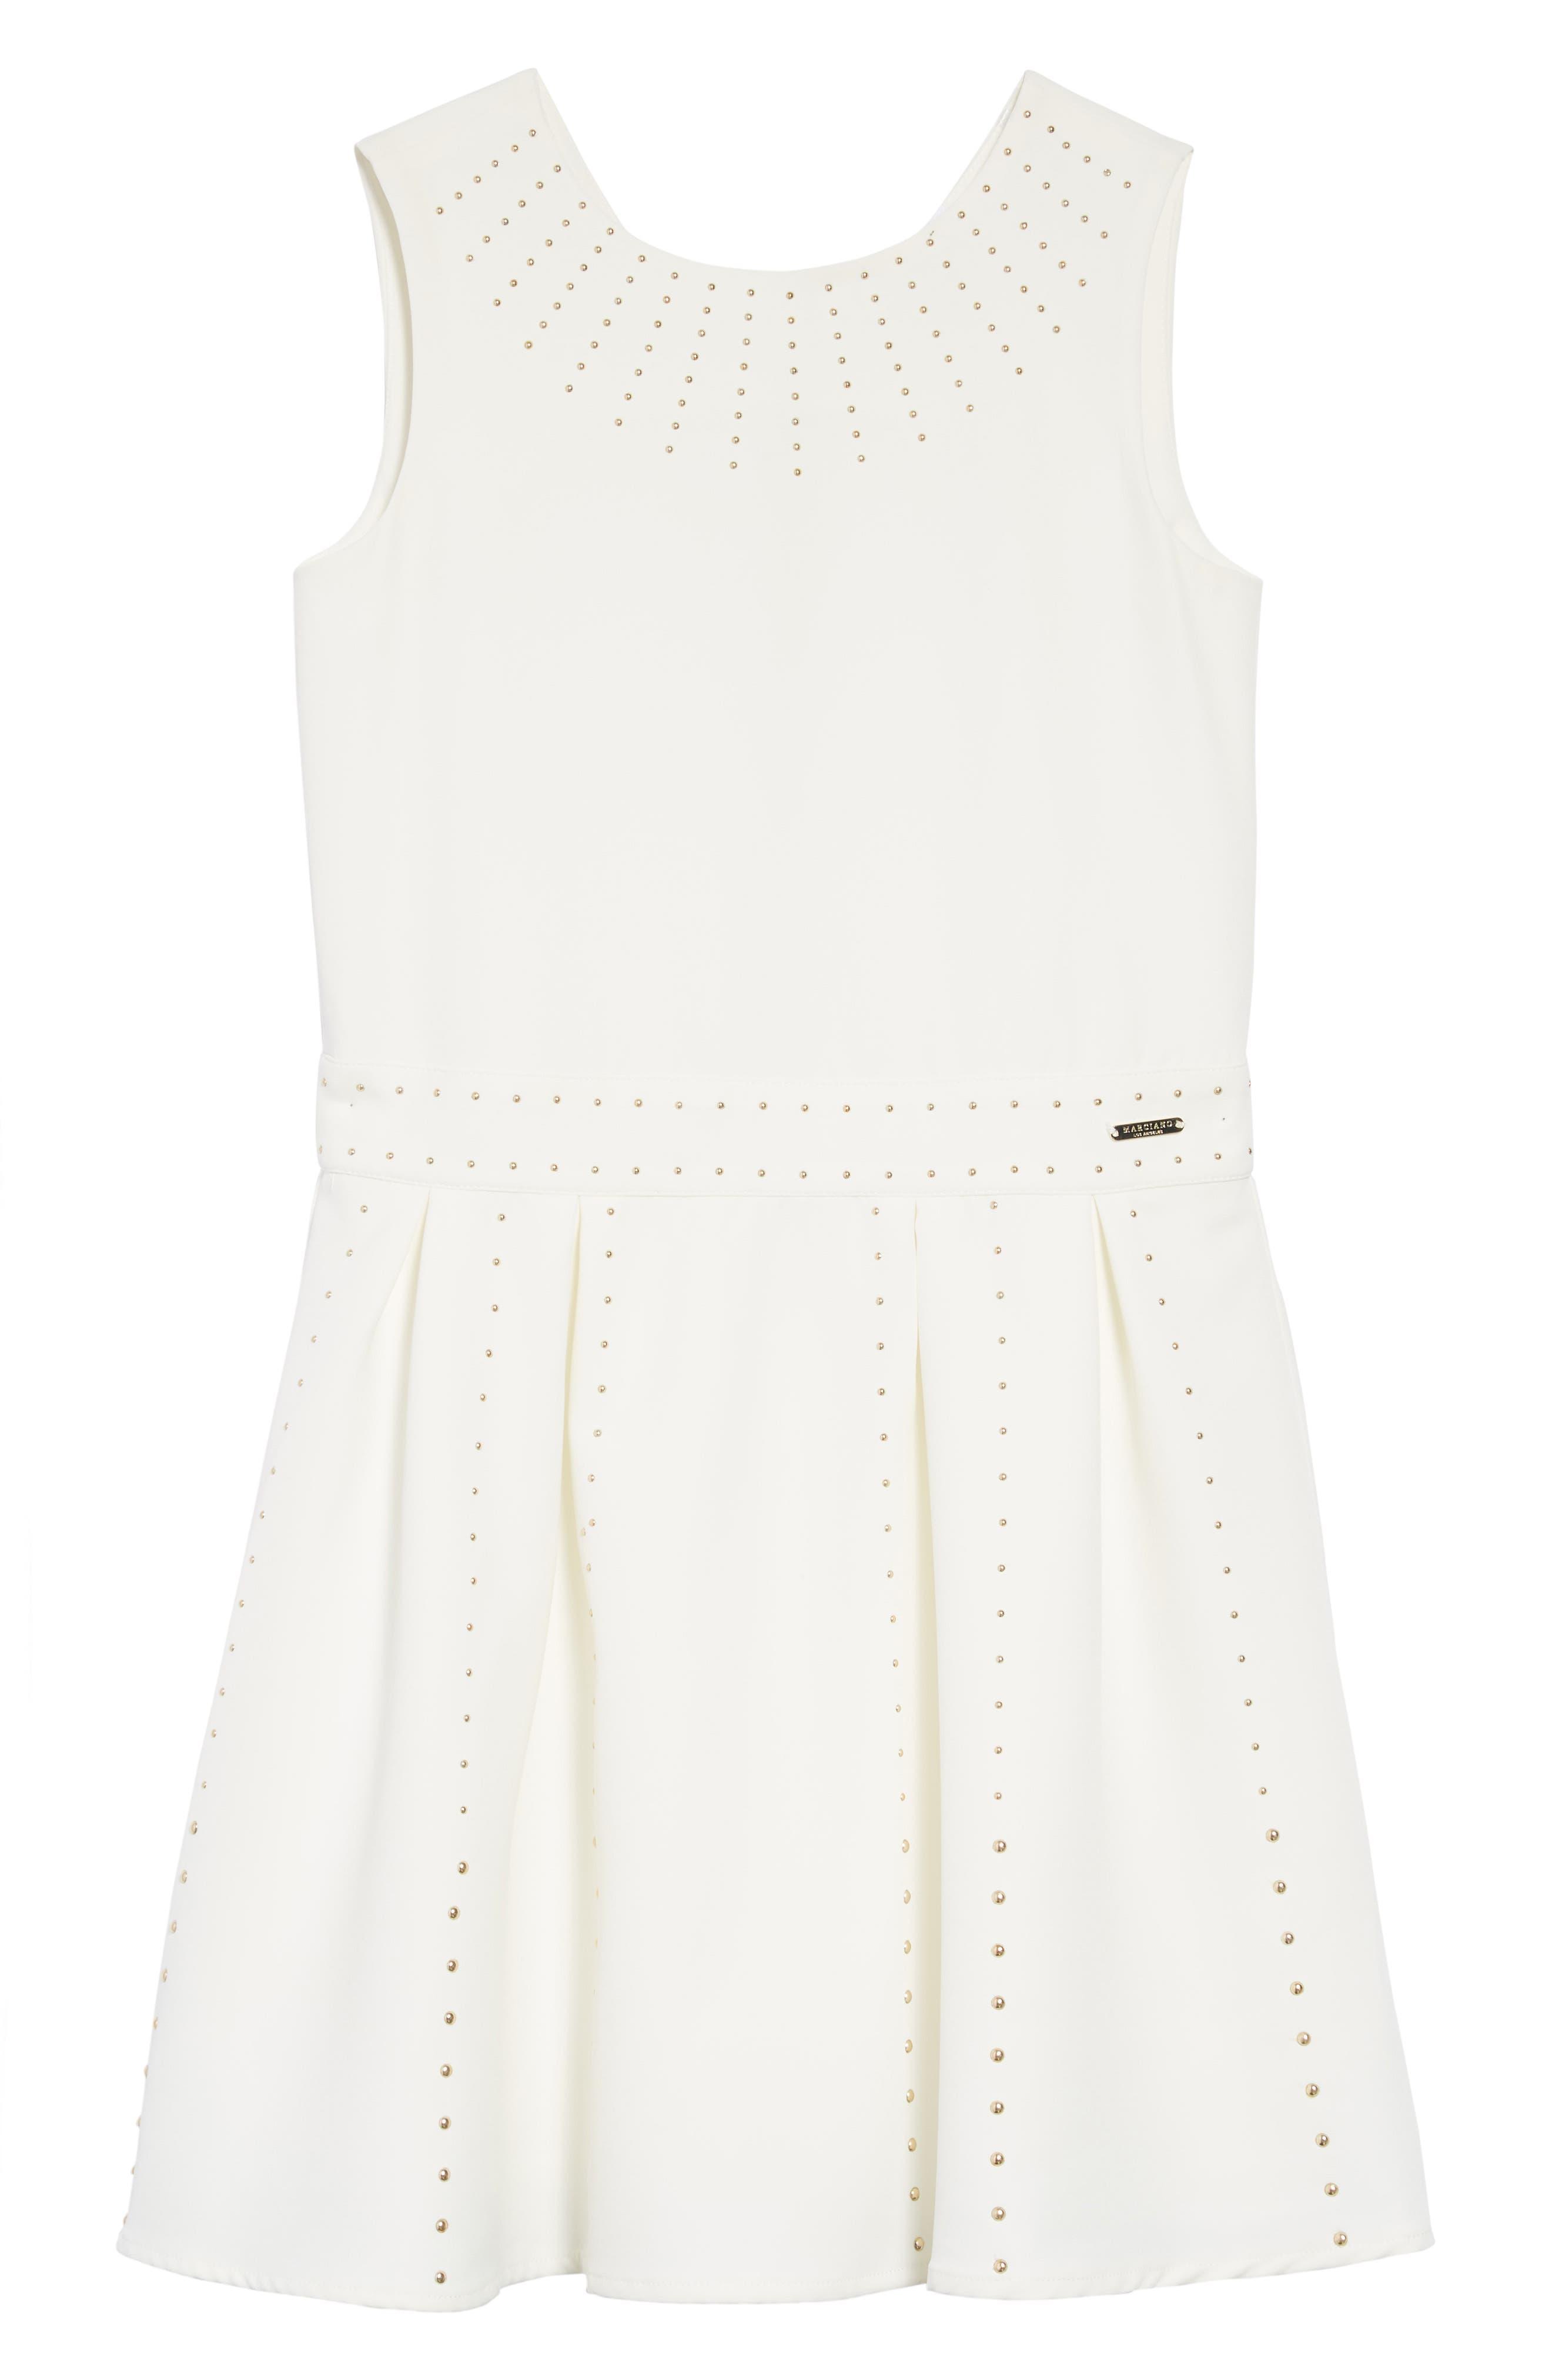 Studded Skater Dress,                             Main thumbnail 1, color,                             True White A000